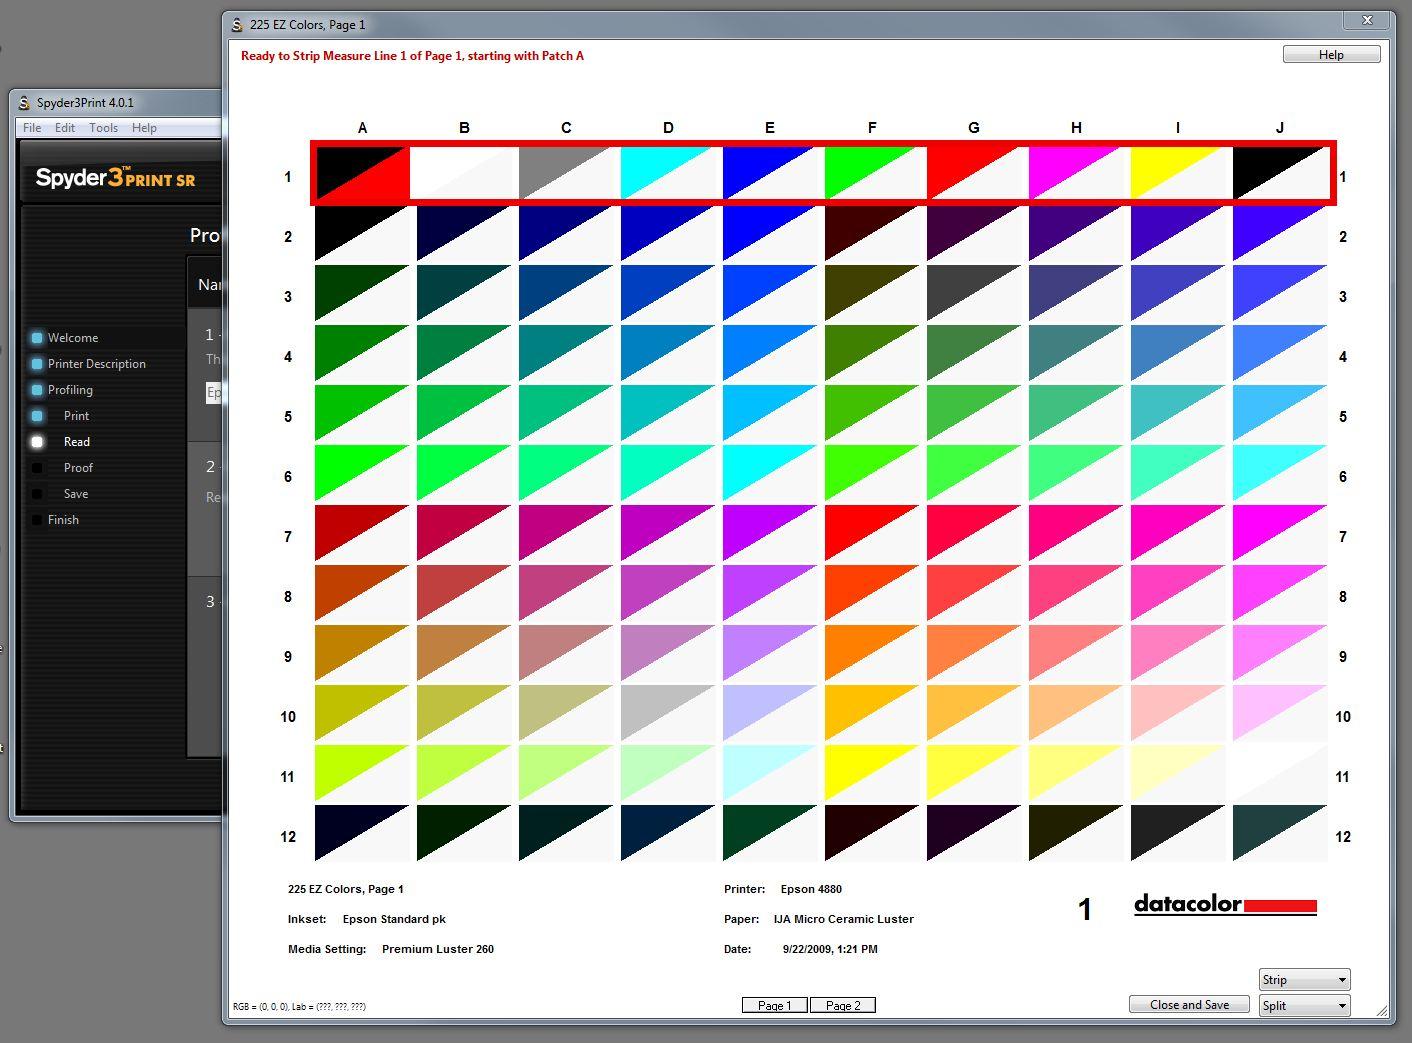 color printer page cost photo - 1